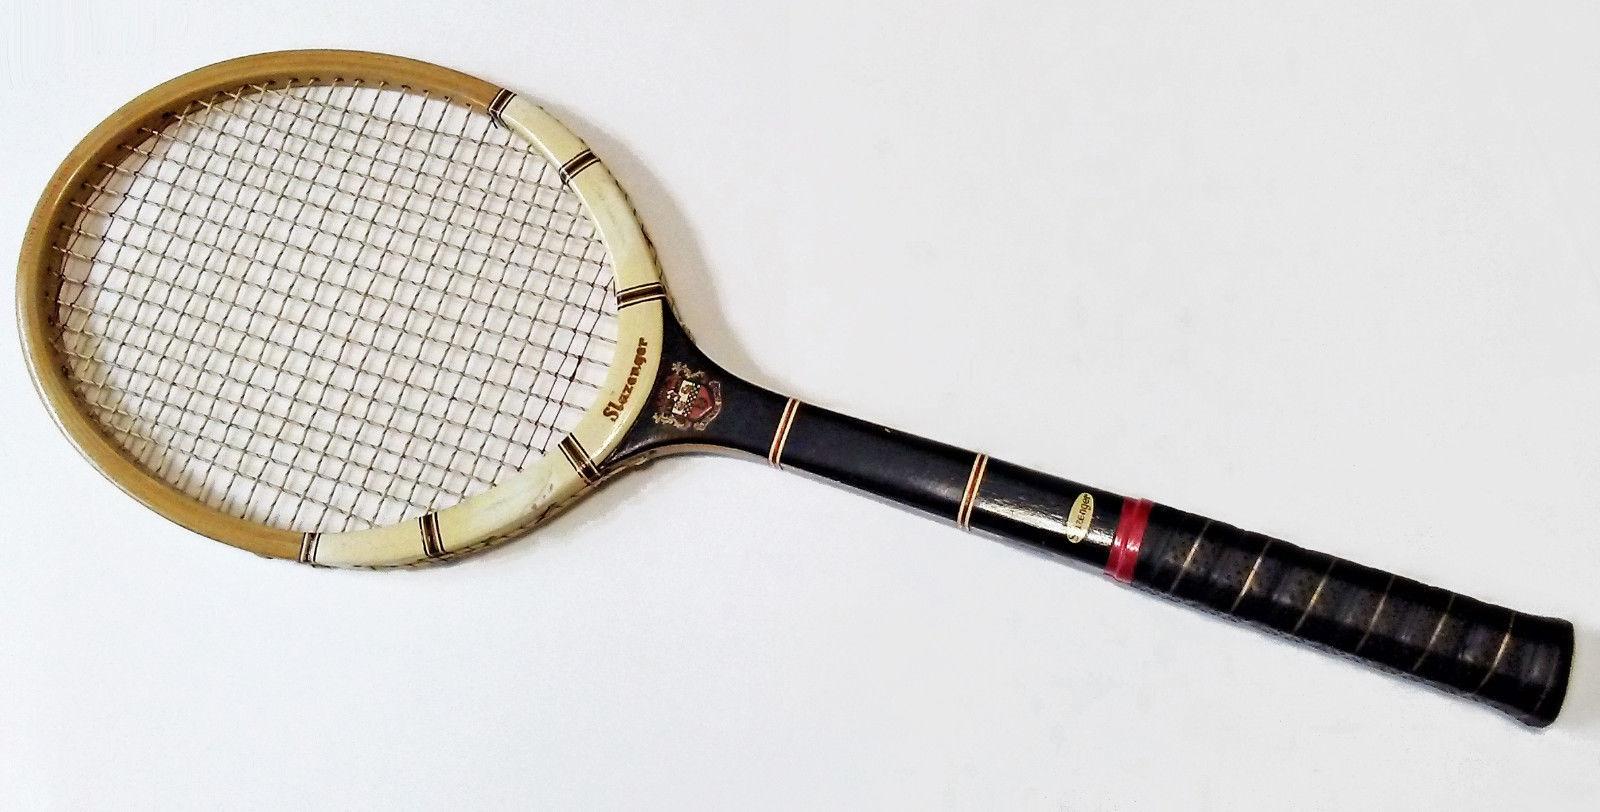 Vintage Slazenger London Wooden Racket Made in England Permalock Bonding Medium